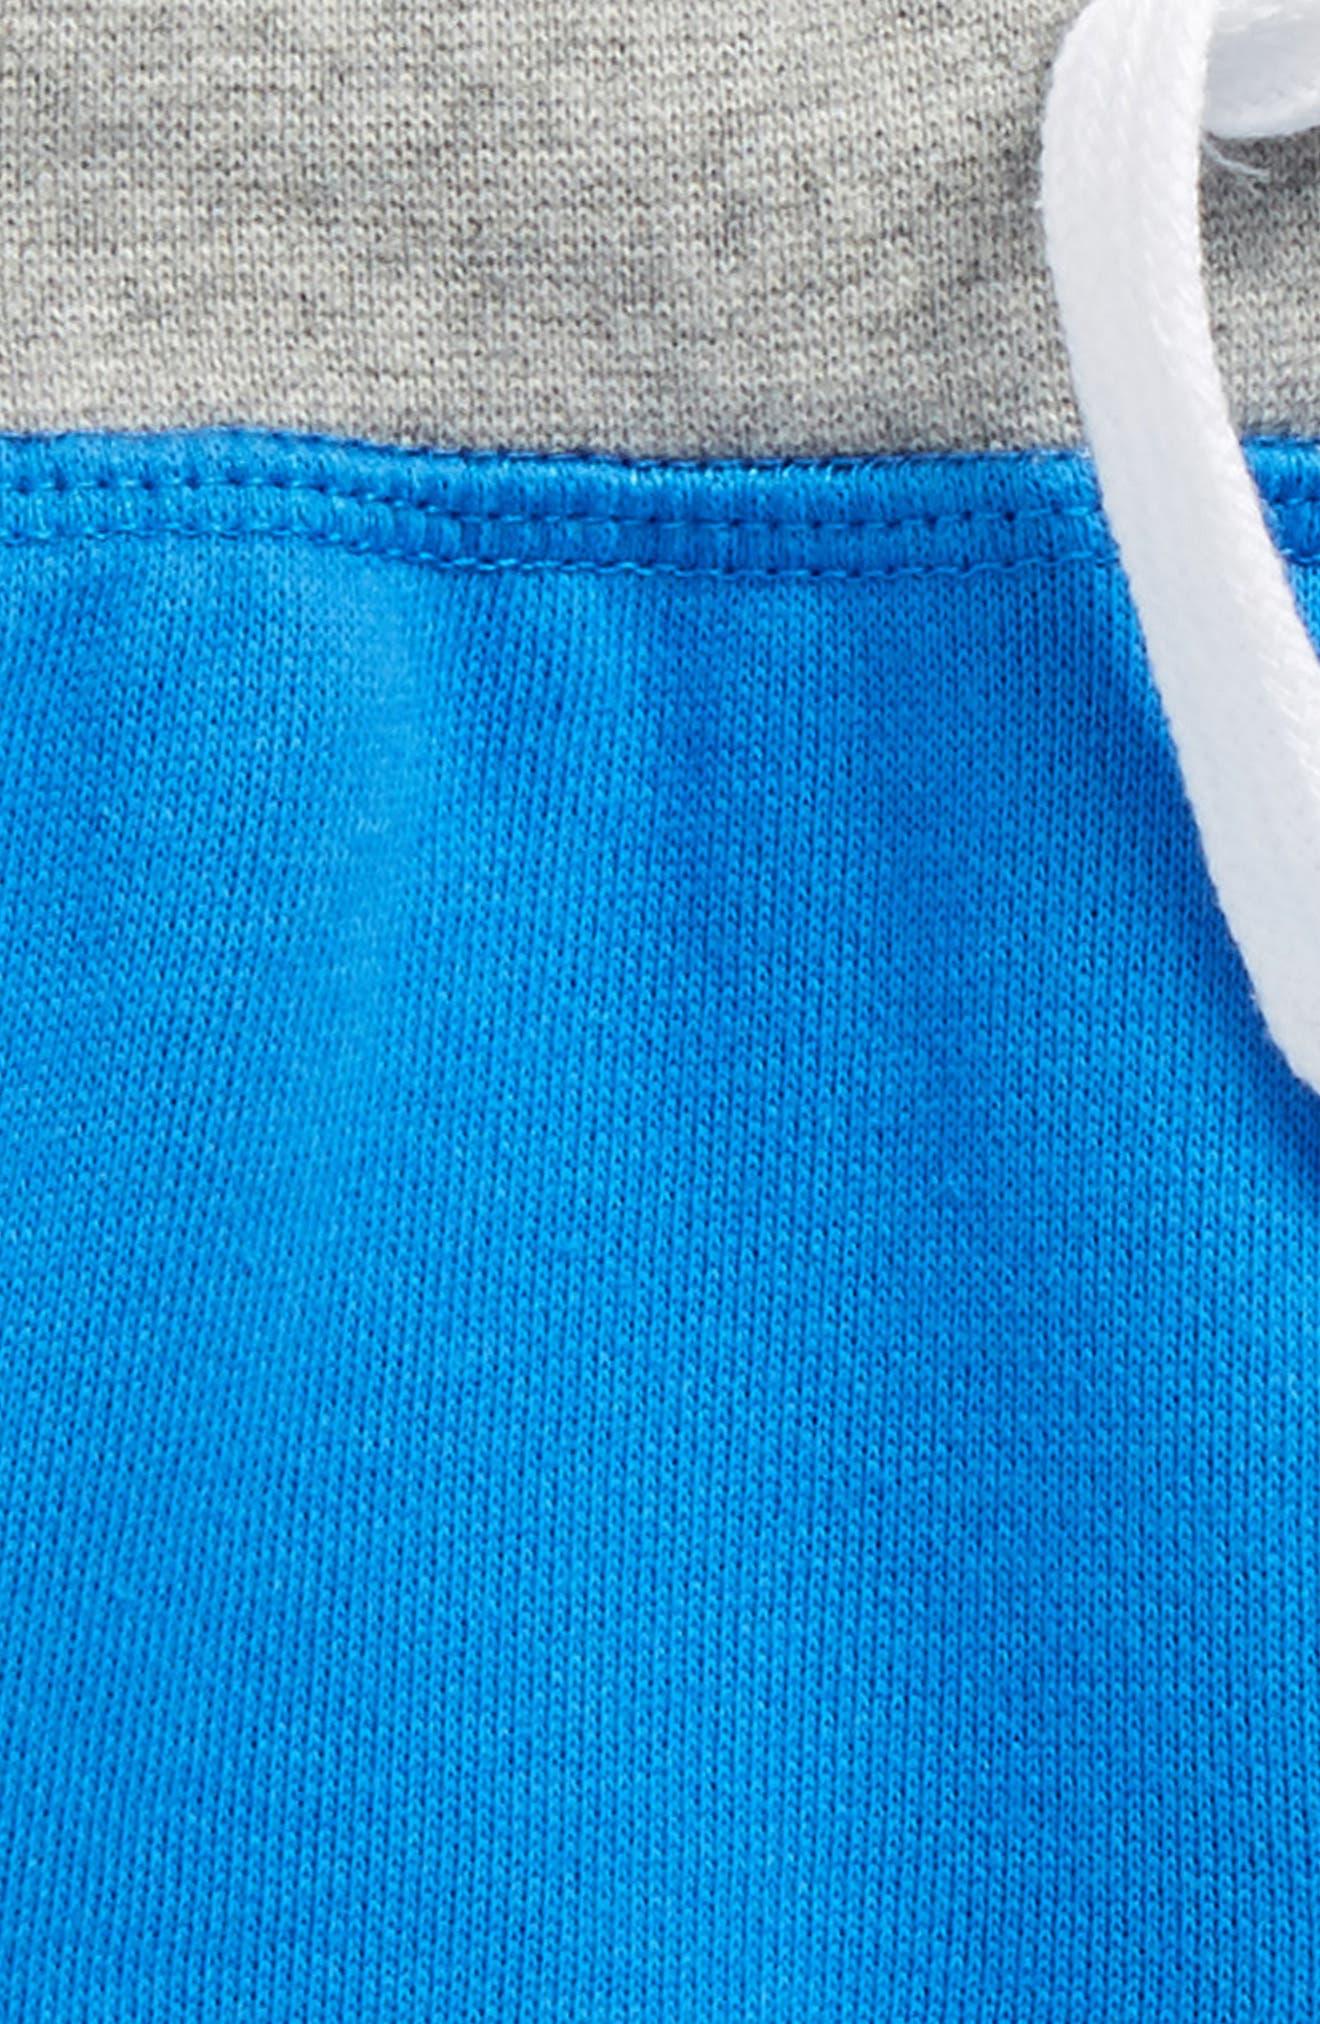 Pull On Shorts,                             Alternate thumbnail 2, color,                             Blue Lolite